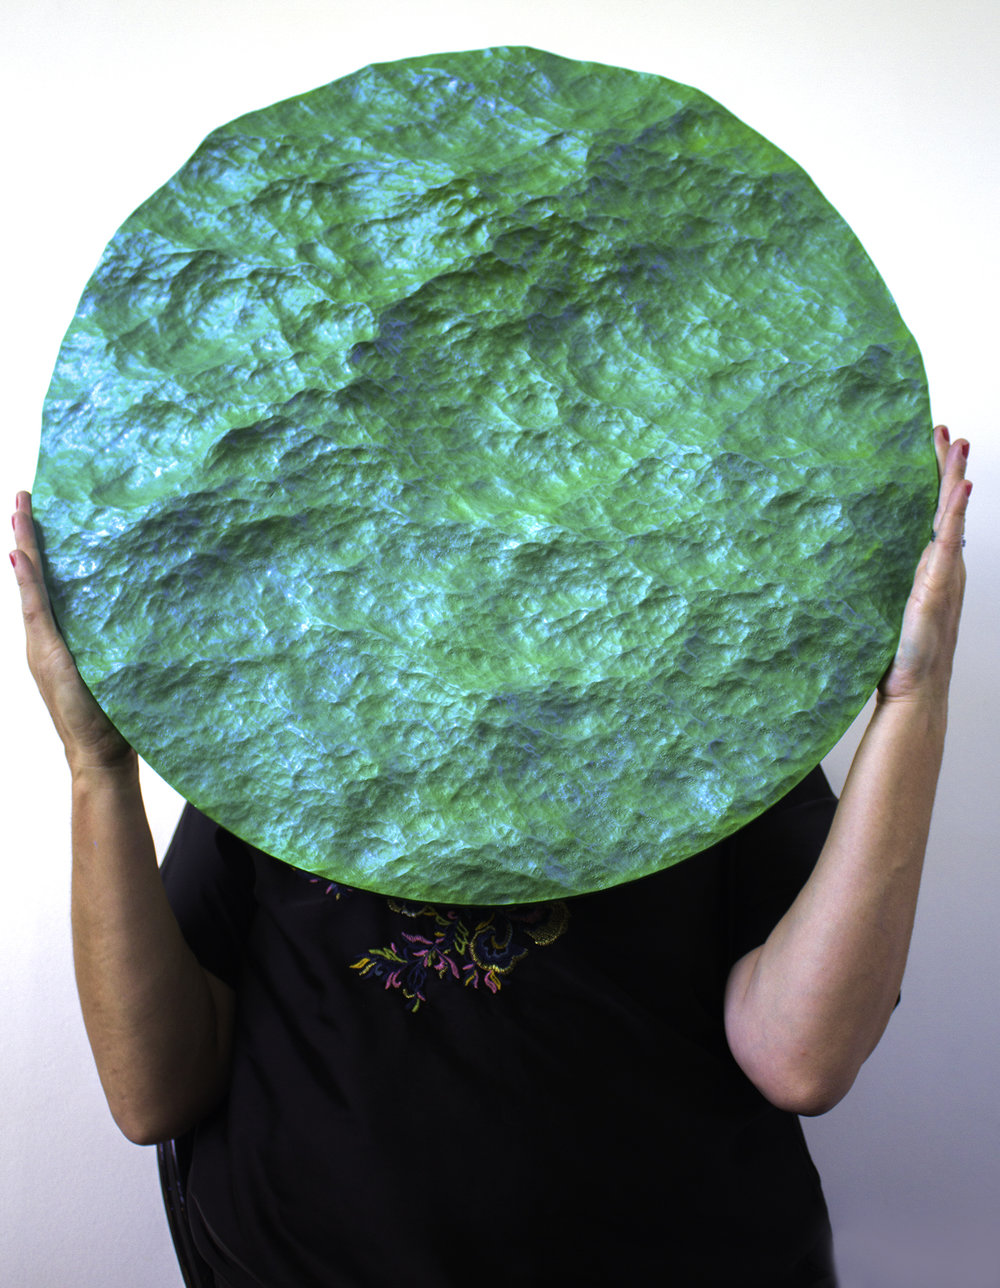 belinda-griffiths-holding-phospherescent-.jpg